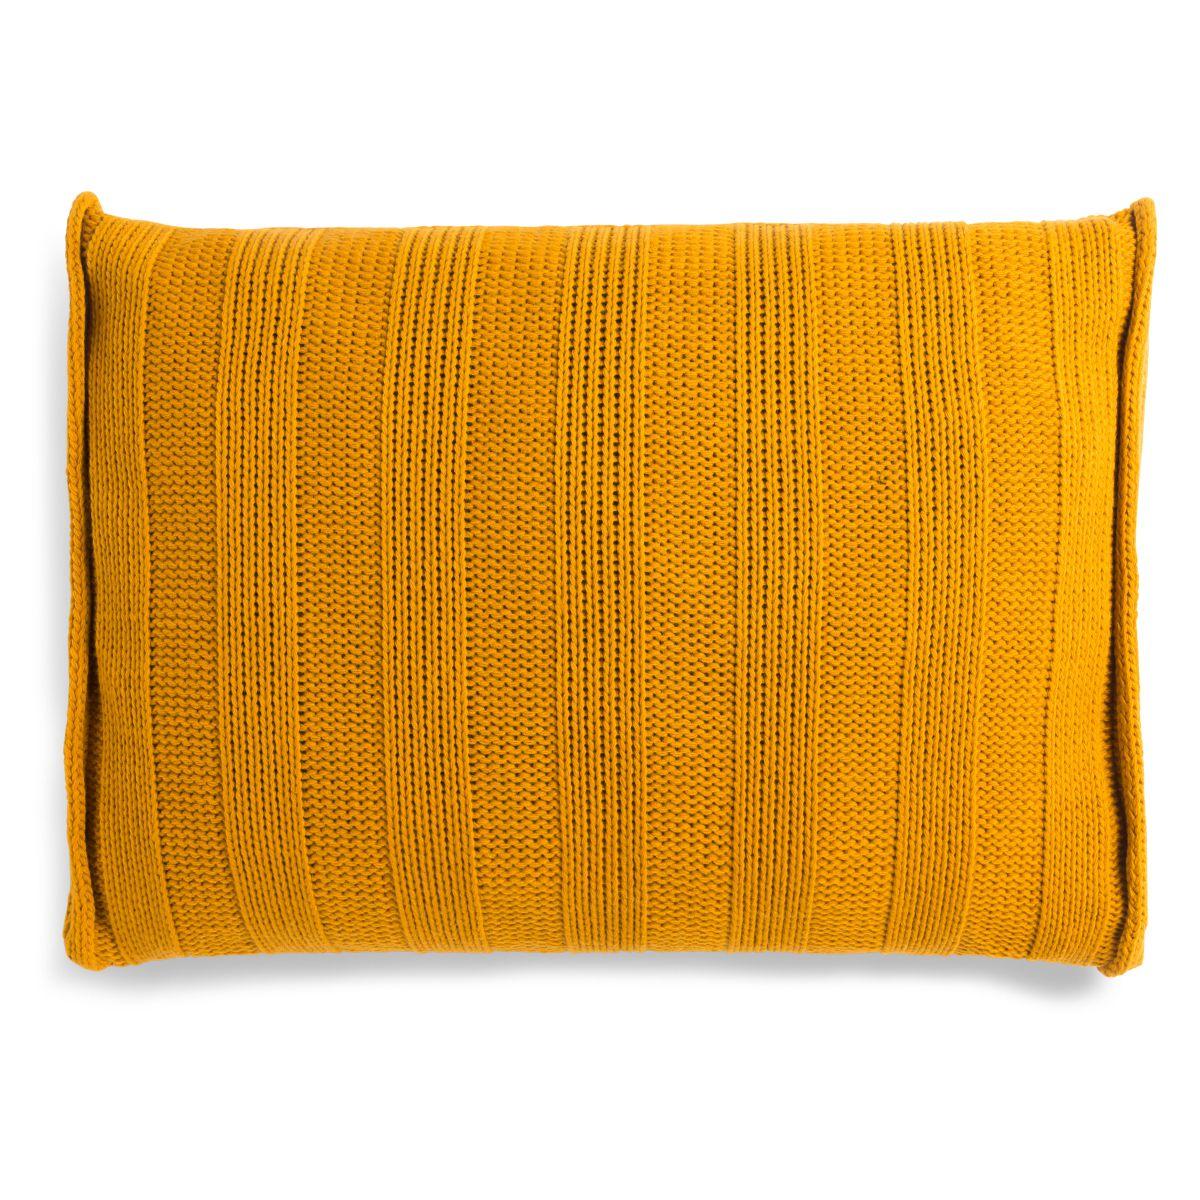 jesse cushion ochre 60x40